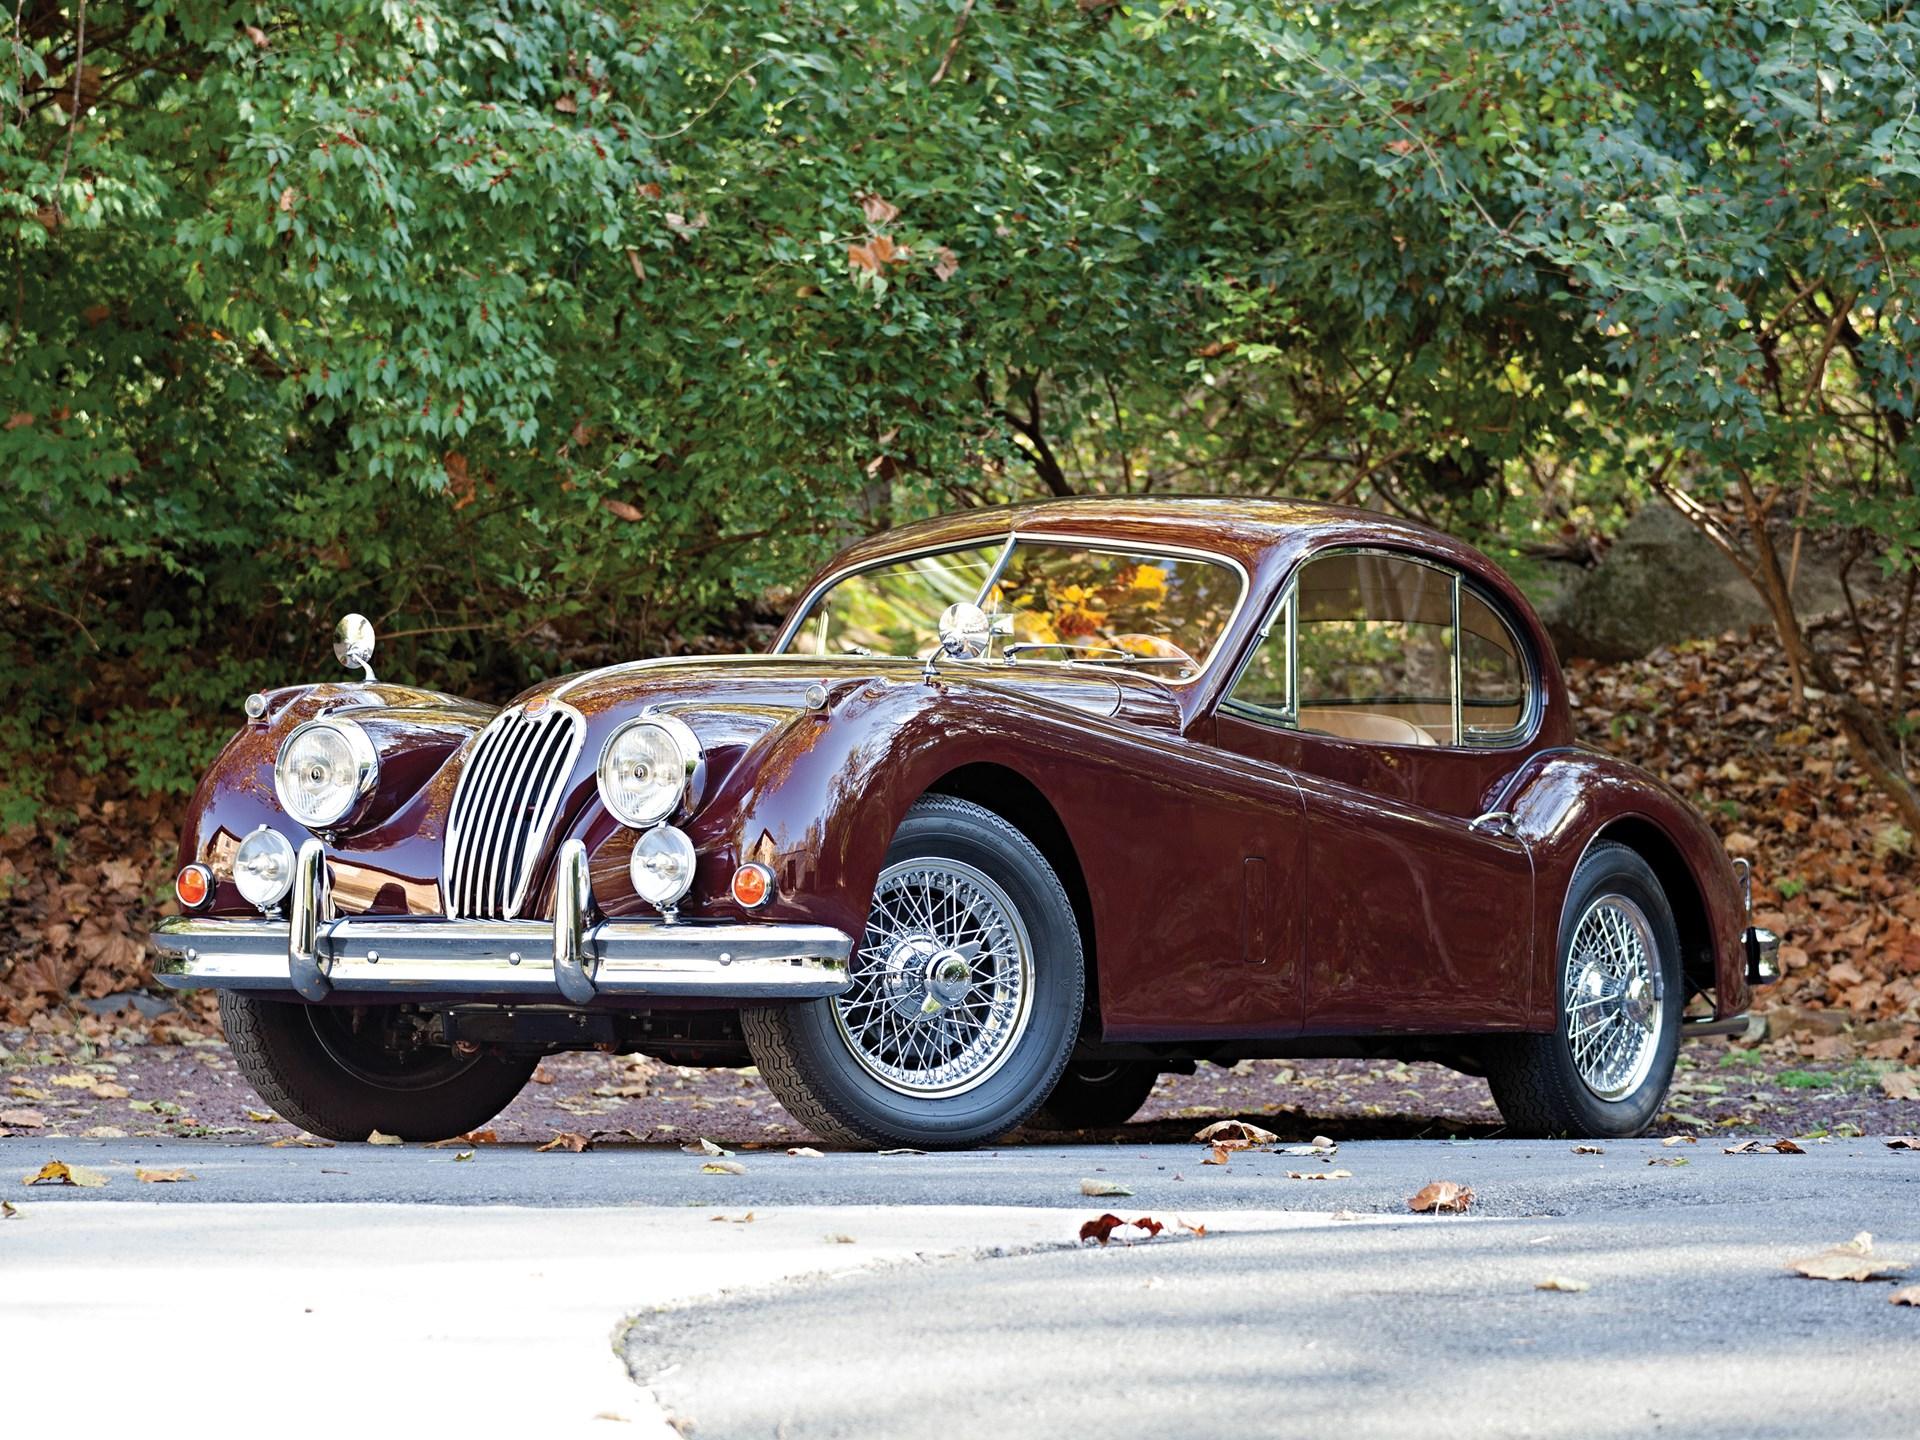 RM Sotheby's - 1955 Jaguar XK140 MC Fixed Head Coupe ...